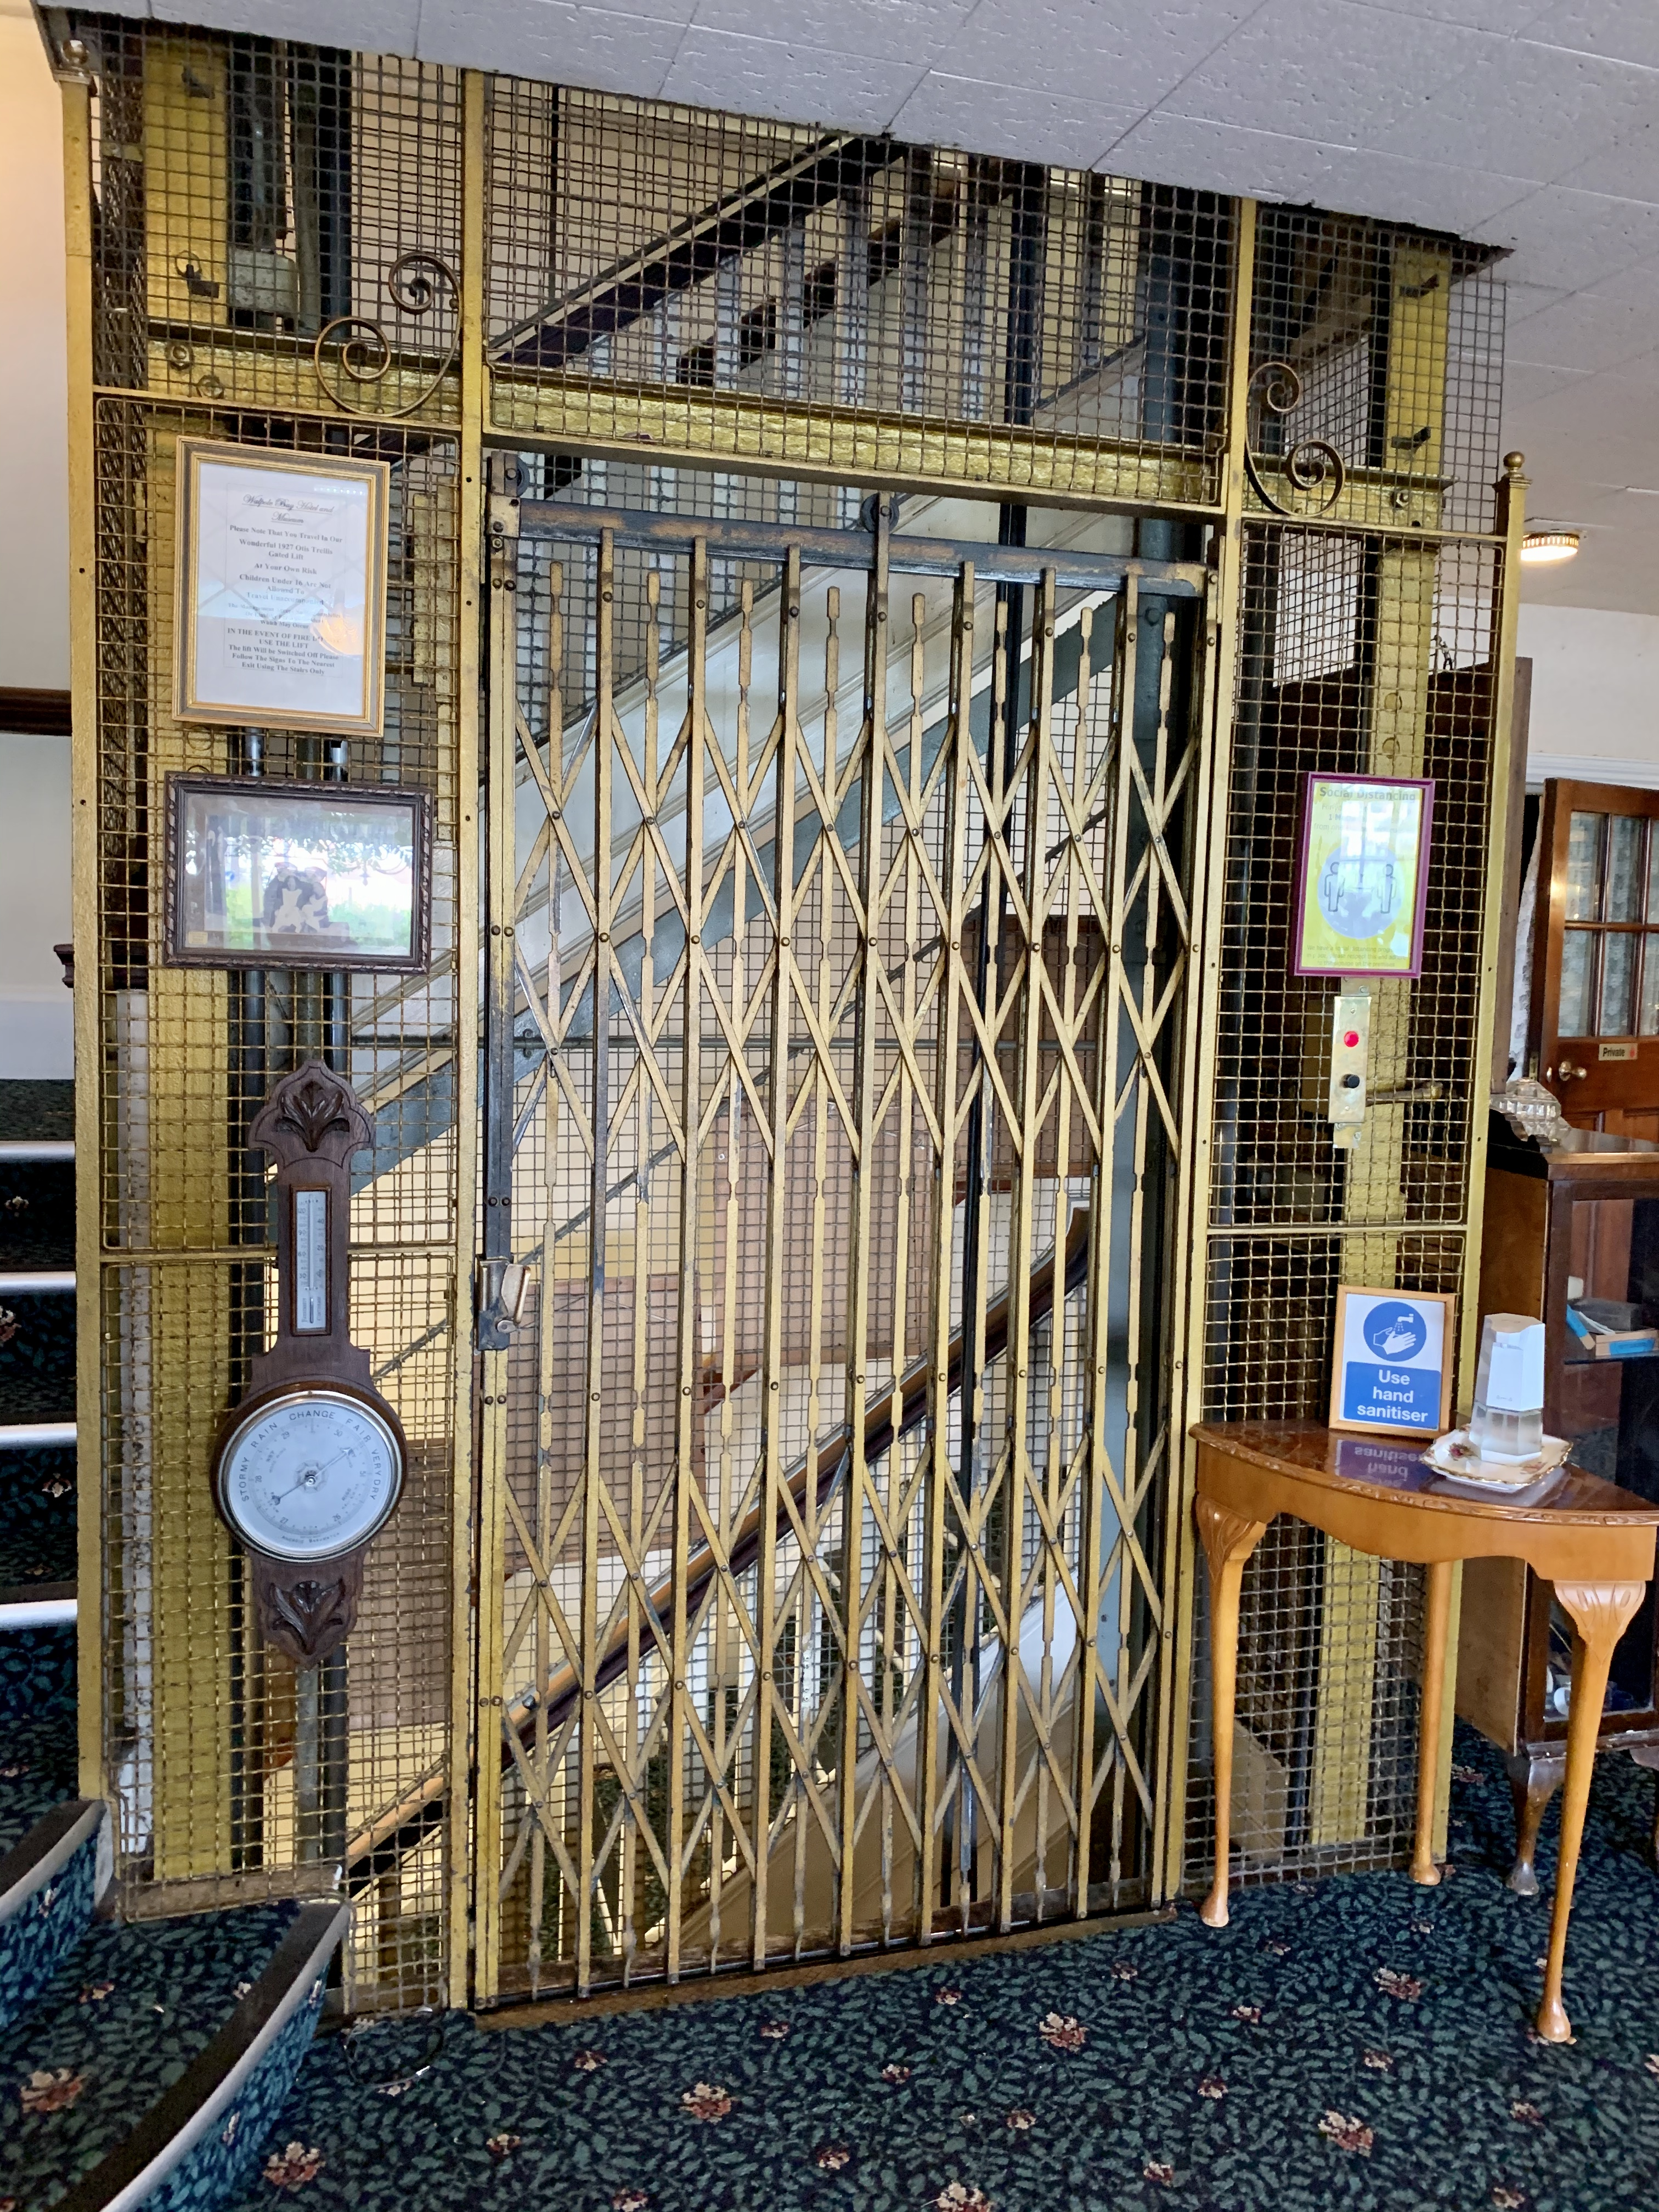 1927 Otis Trellis lift, Walpole Bay Hotel